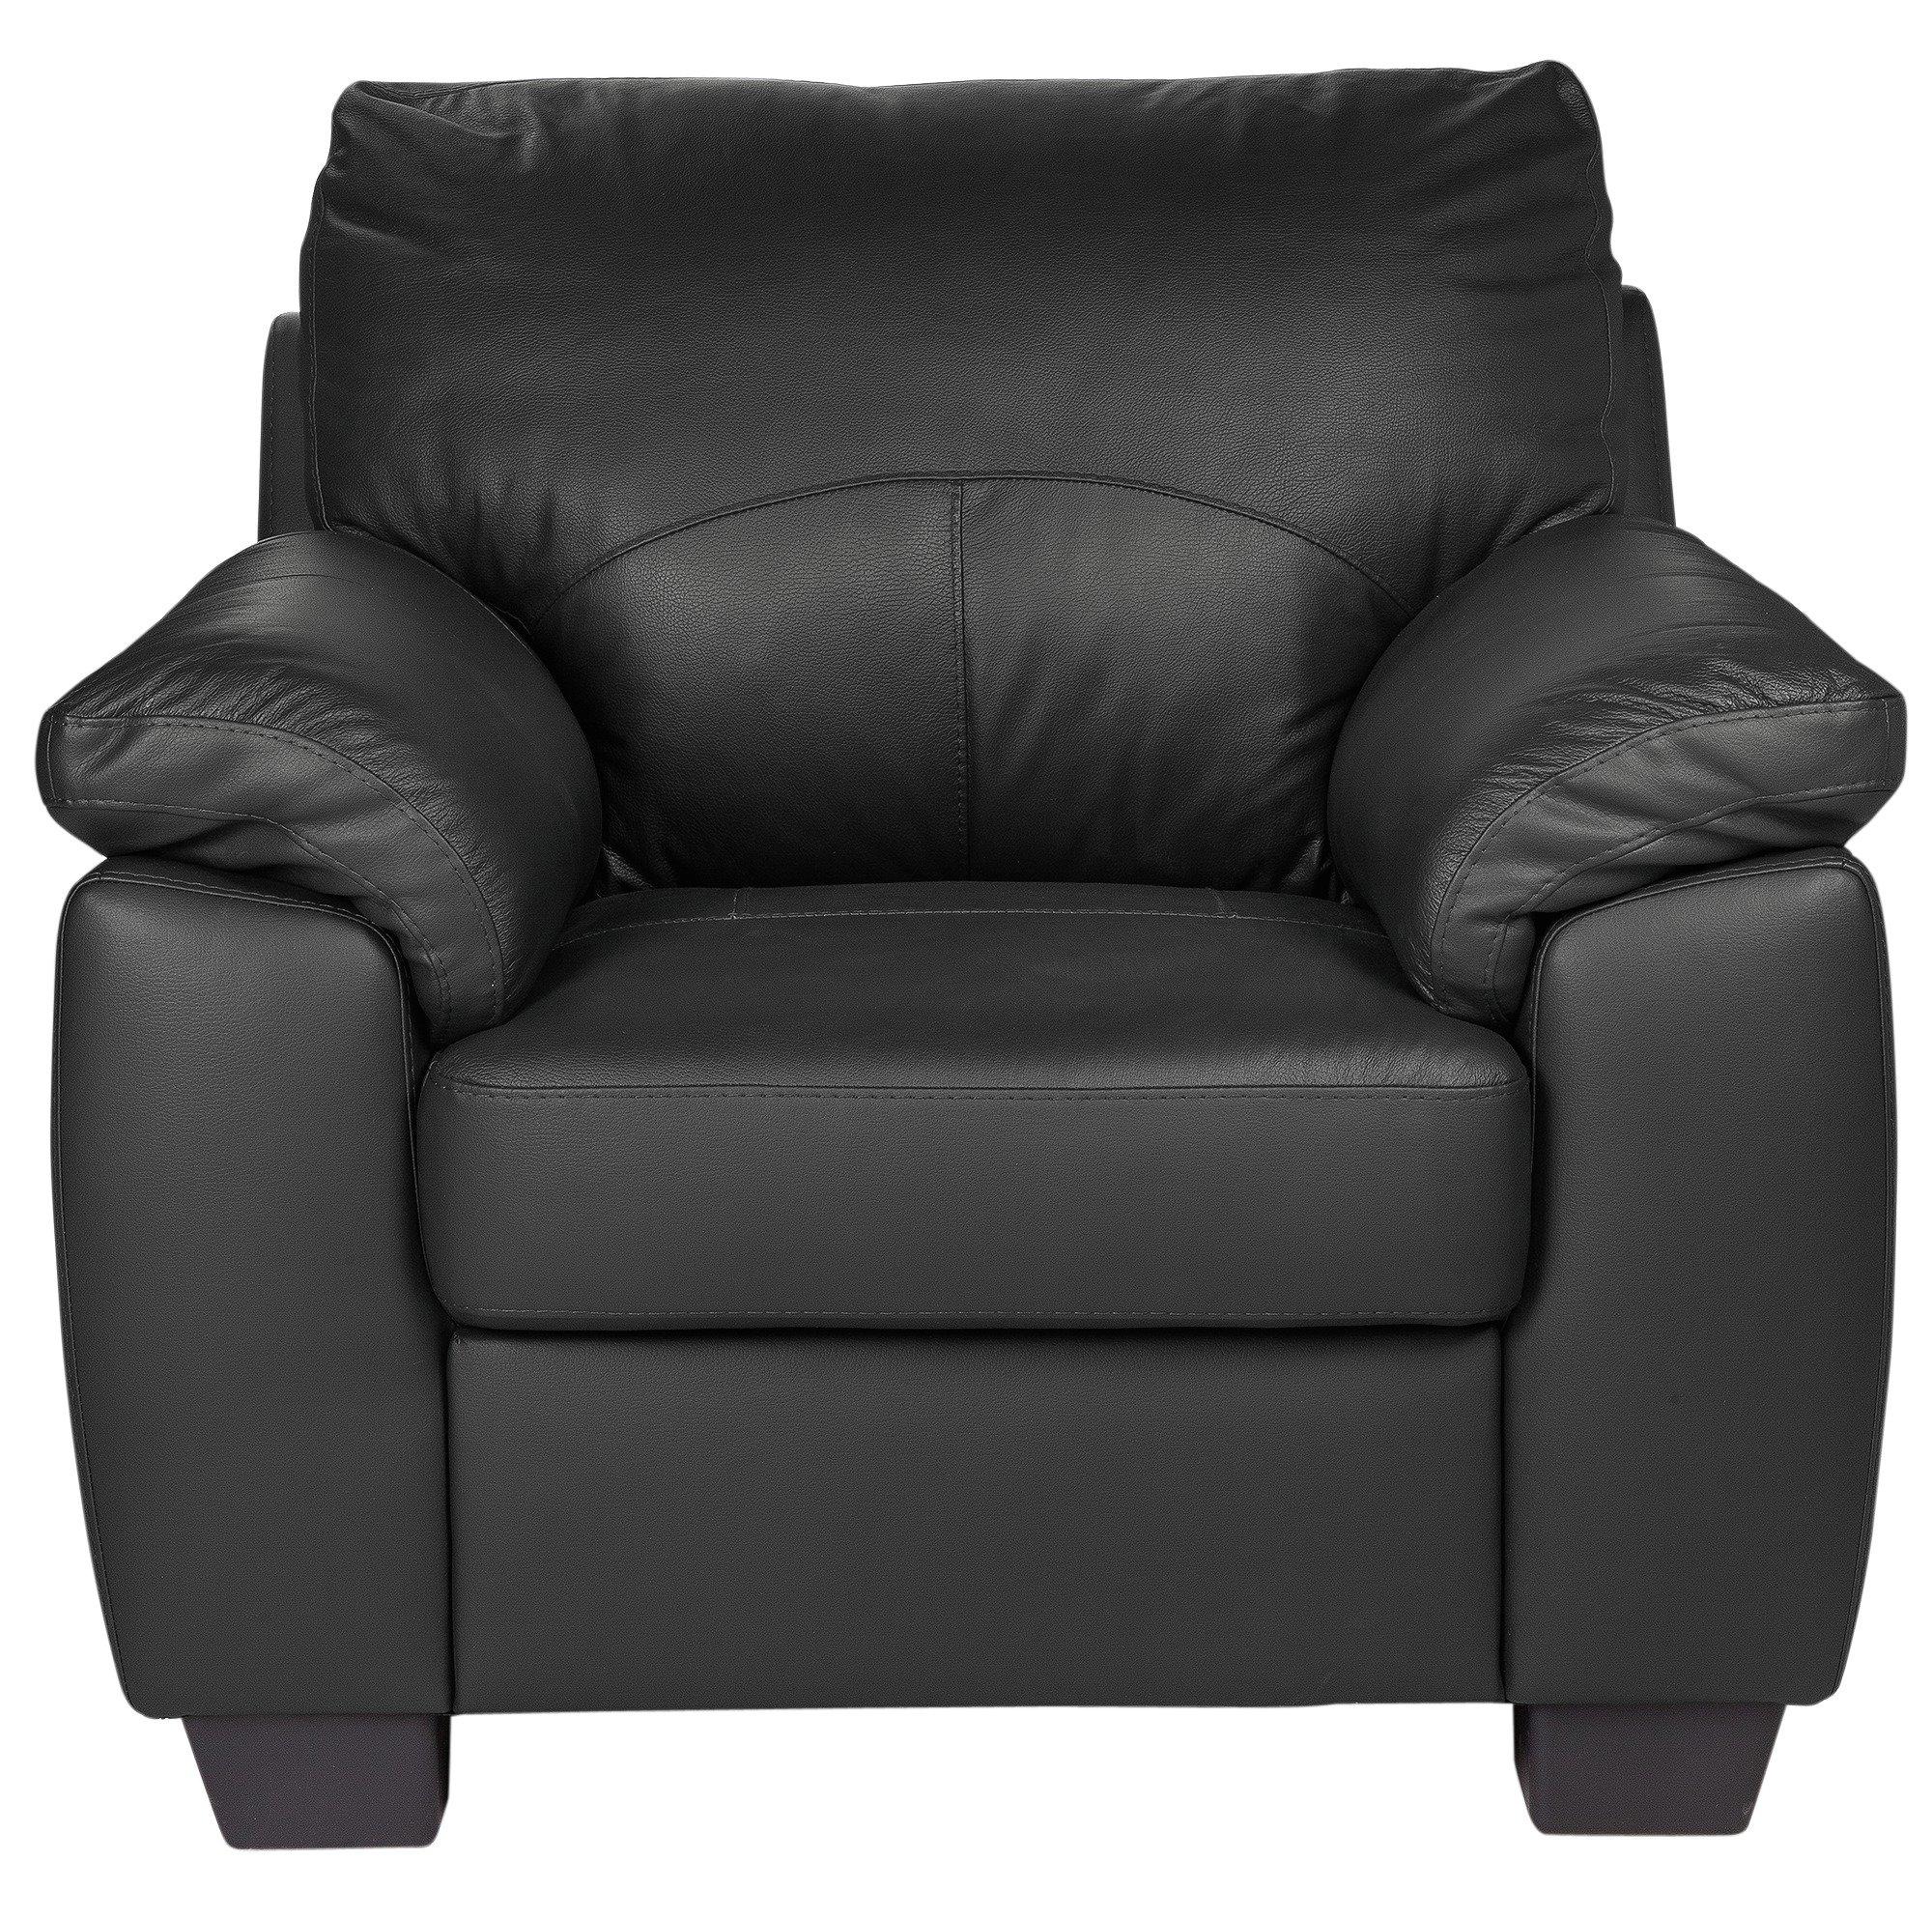 Argos Home Logan Leather Mix Armchair - Black